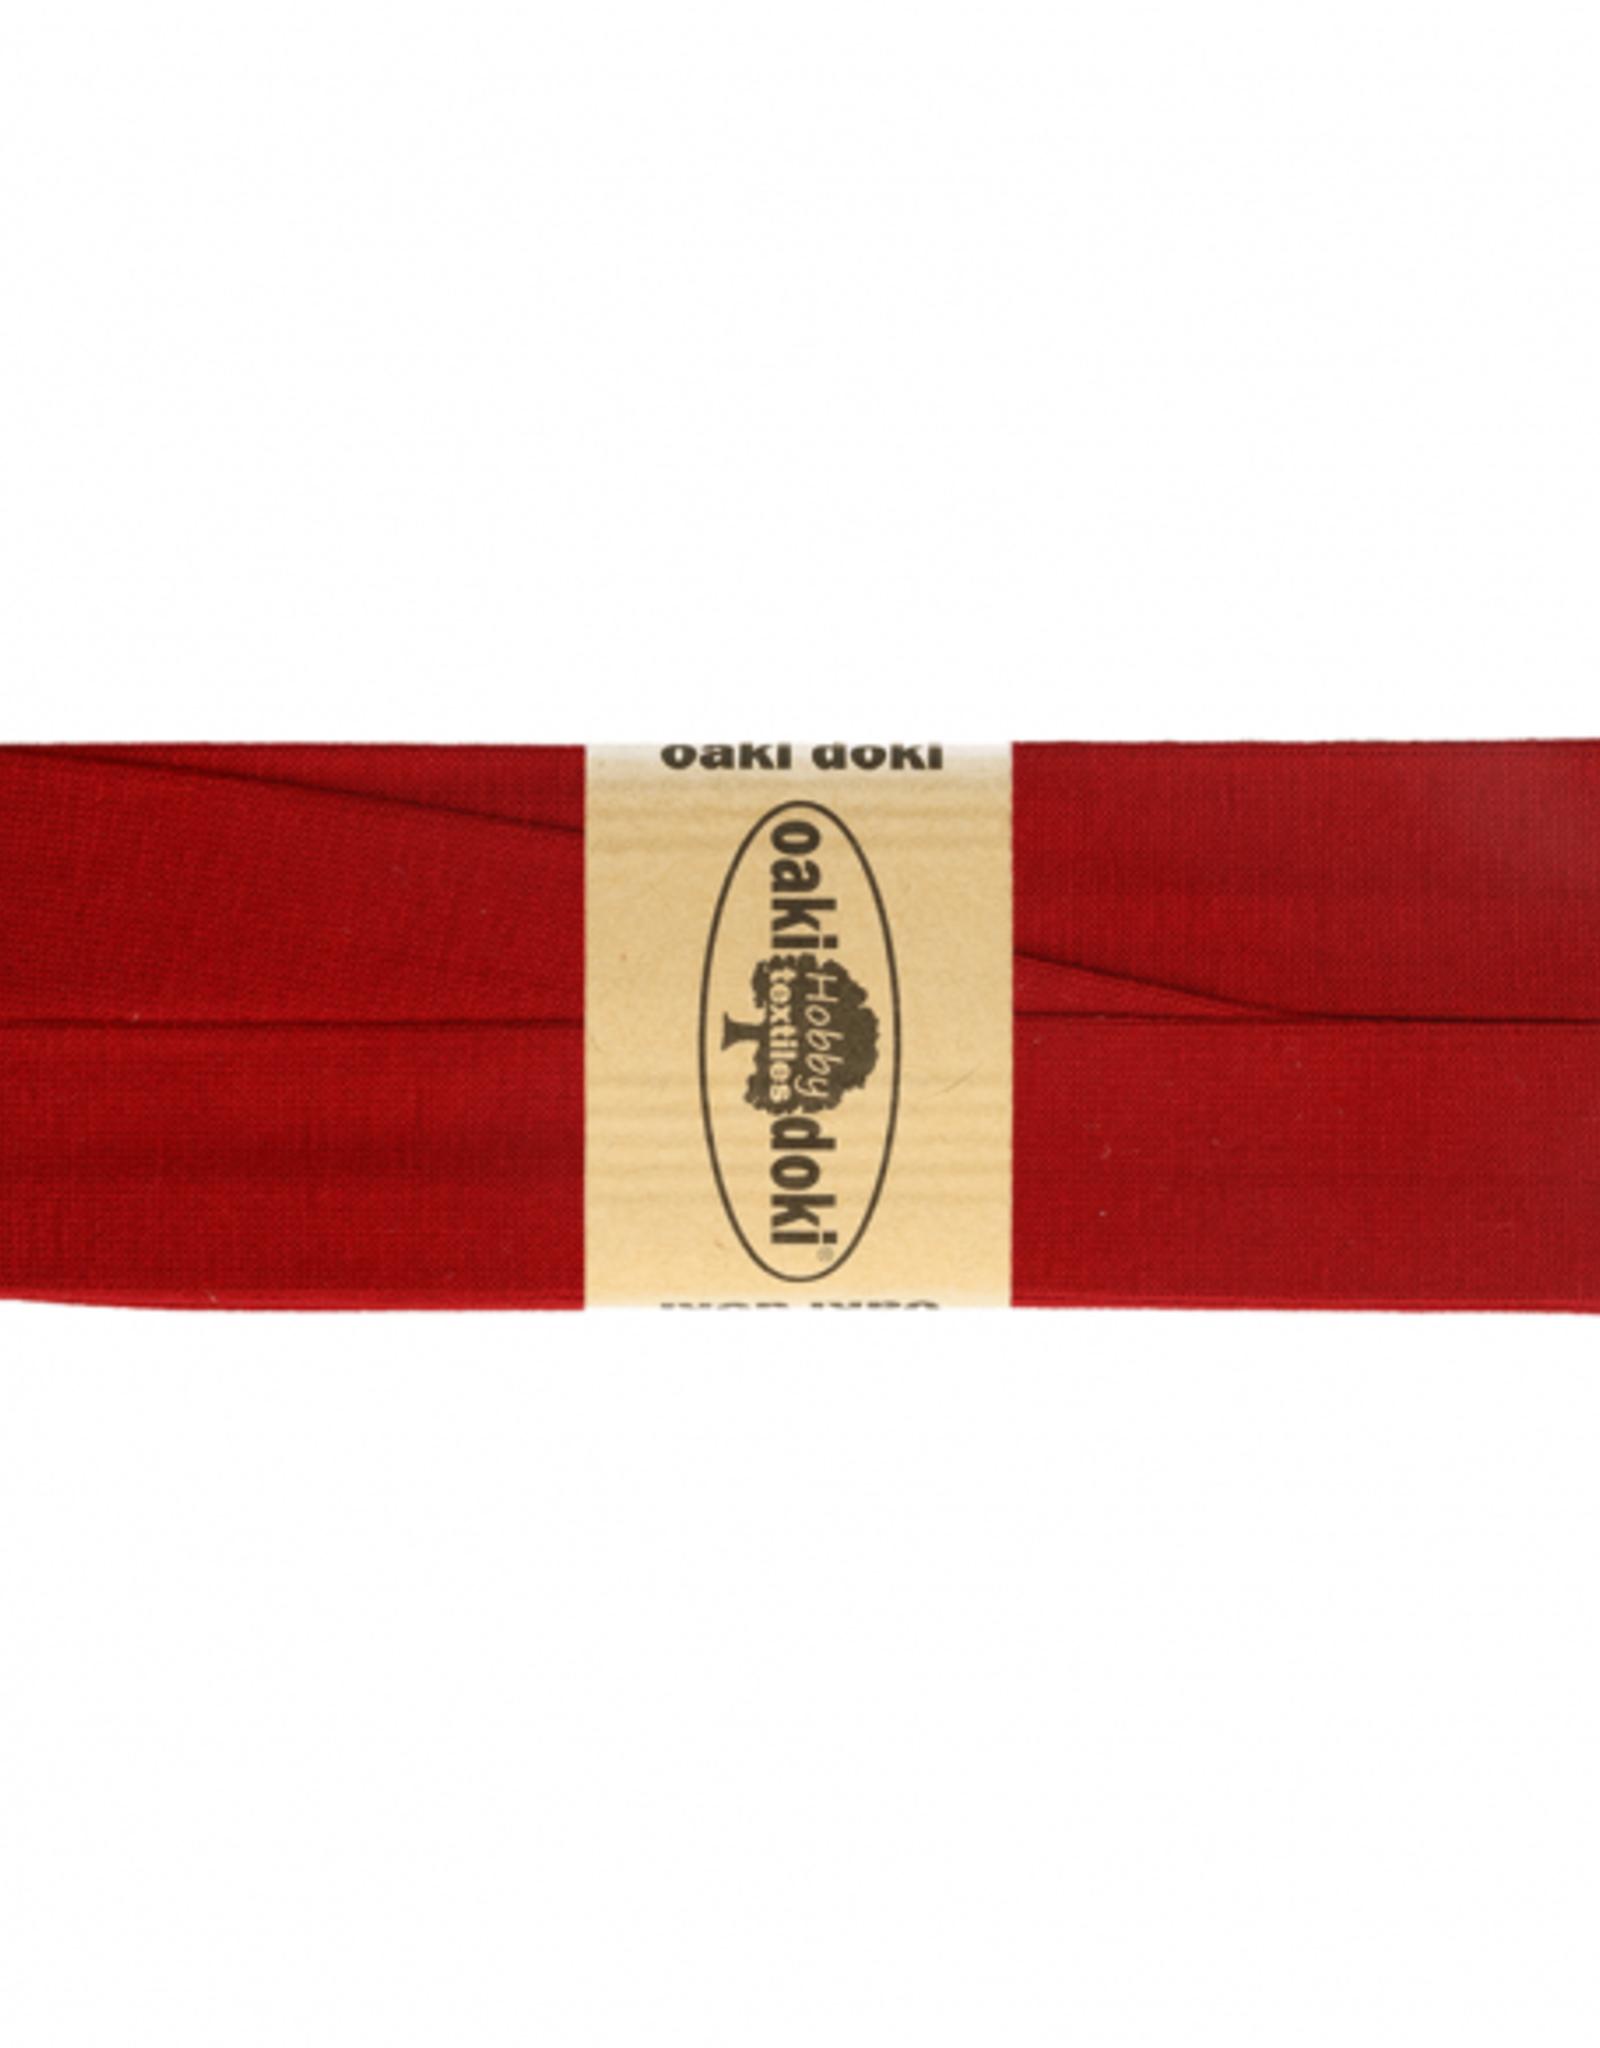 Oaki Doki Tricot de luxe jersey biaisband 20mm x 3m 600